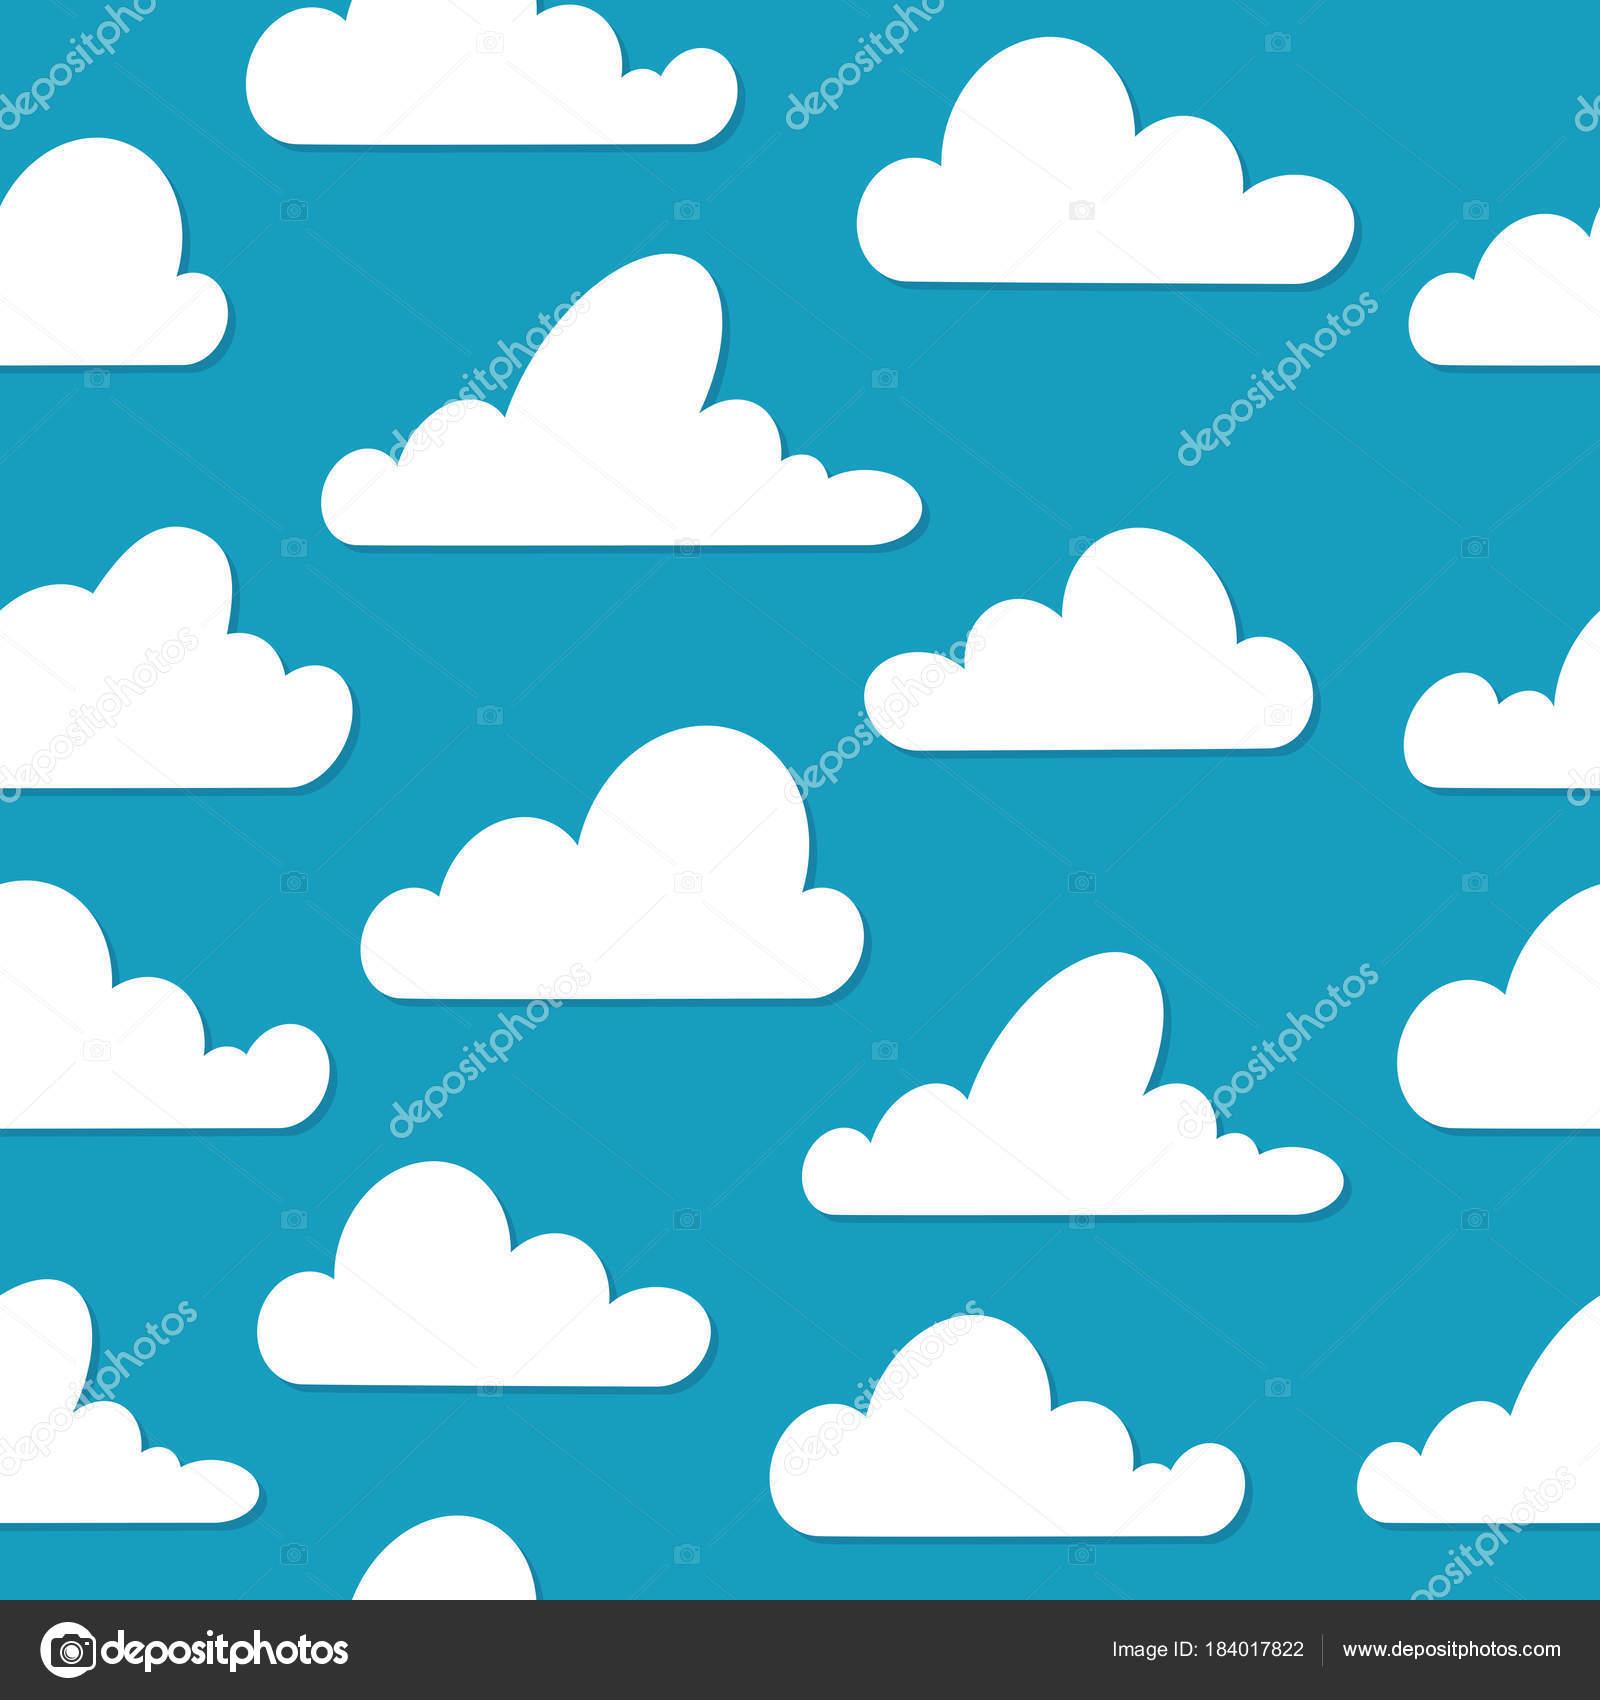 Krasna Modra Obloha S Ruznymi Mraky Vektorove Ilustrace Plochy